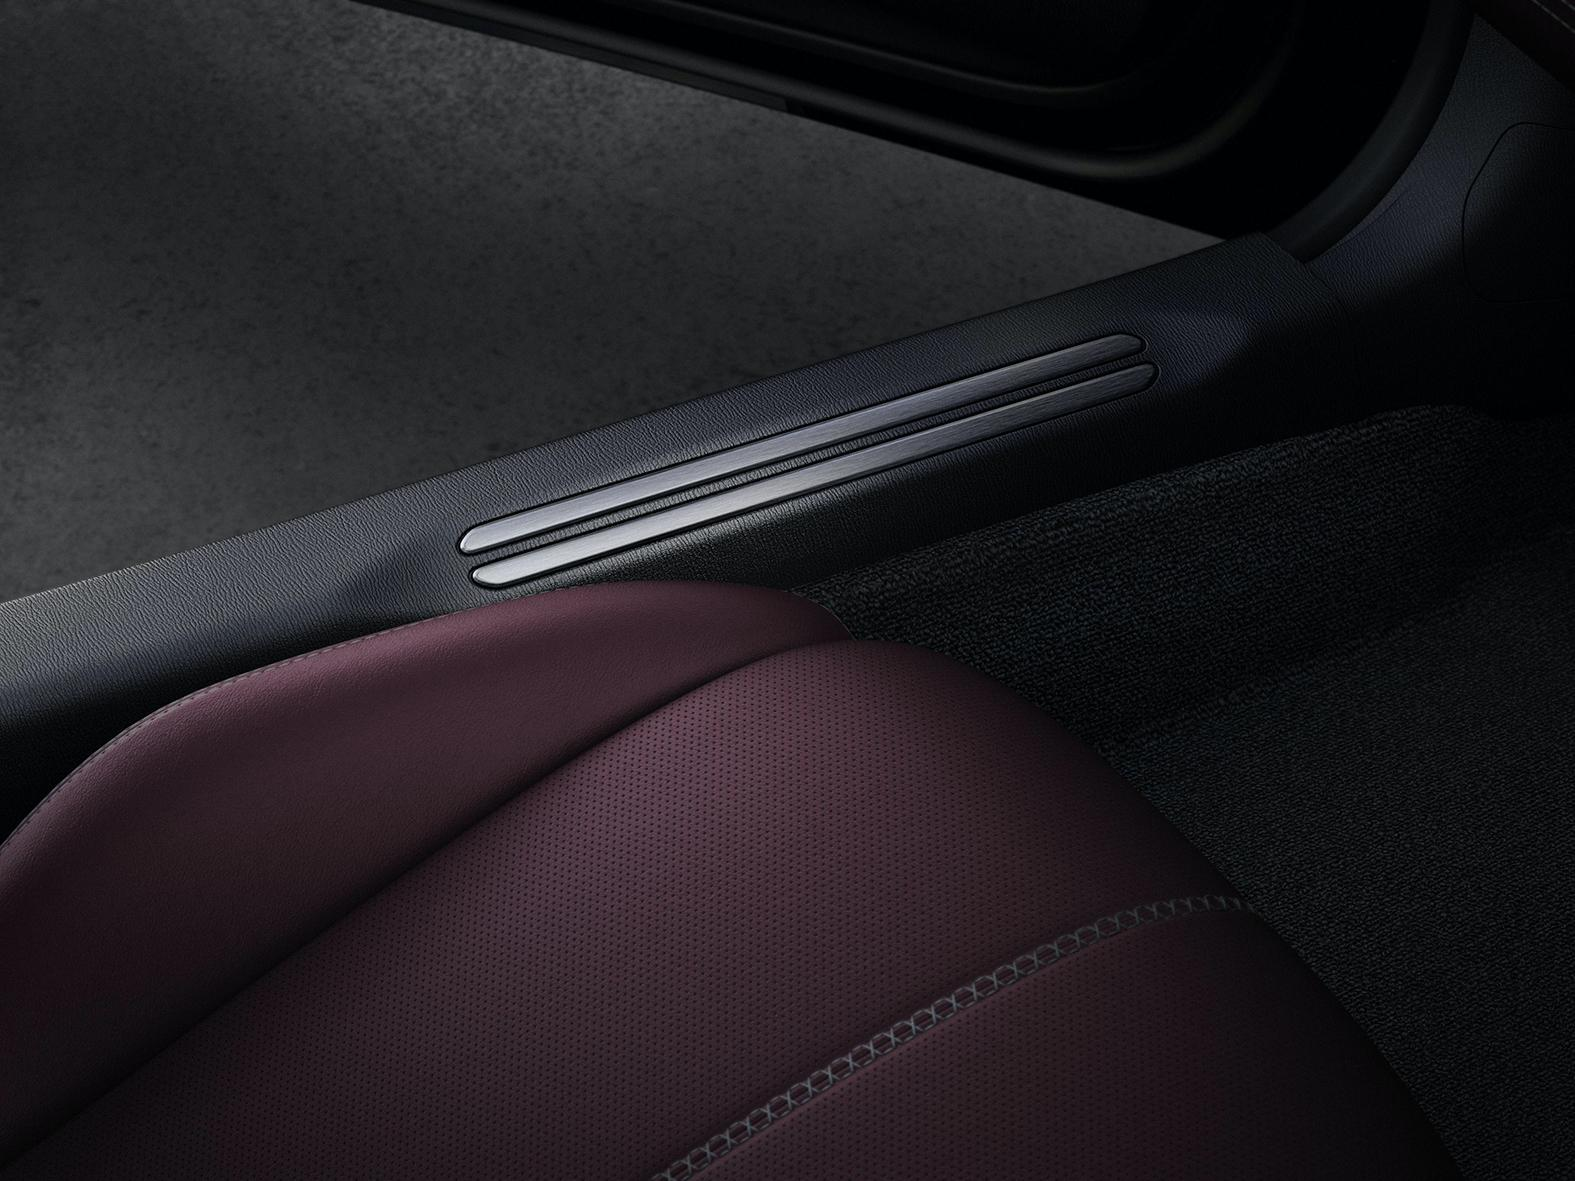 Mazda-MX-5-and-CX-5-2020-11